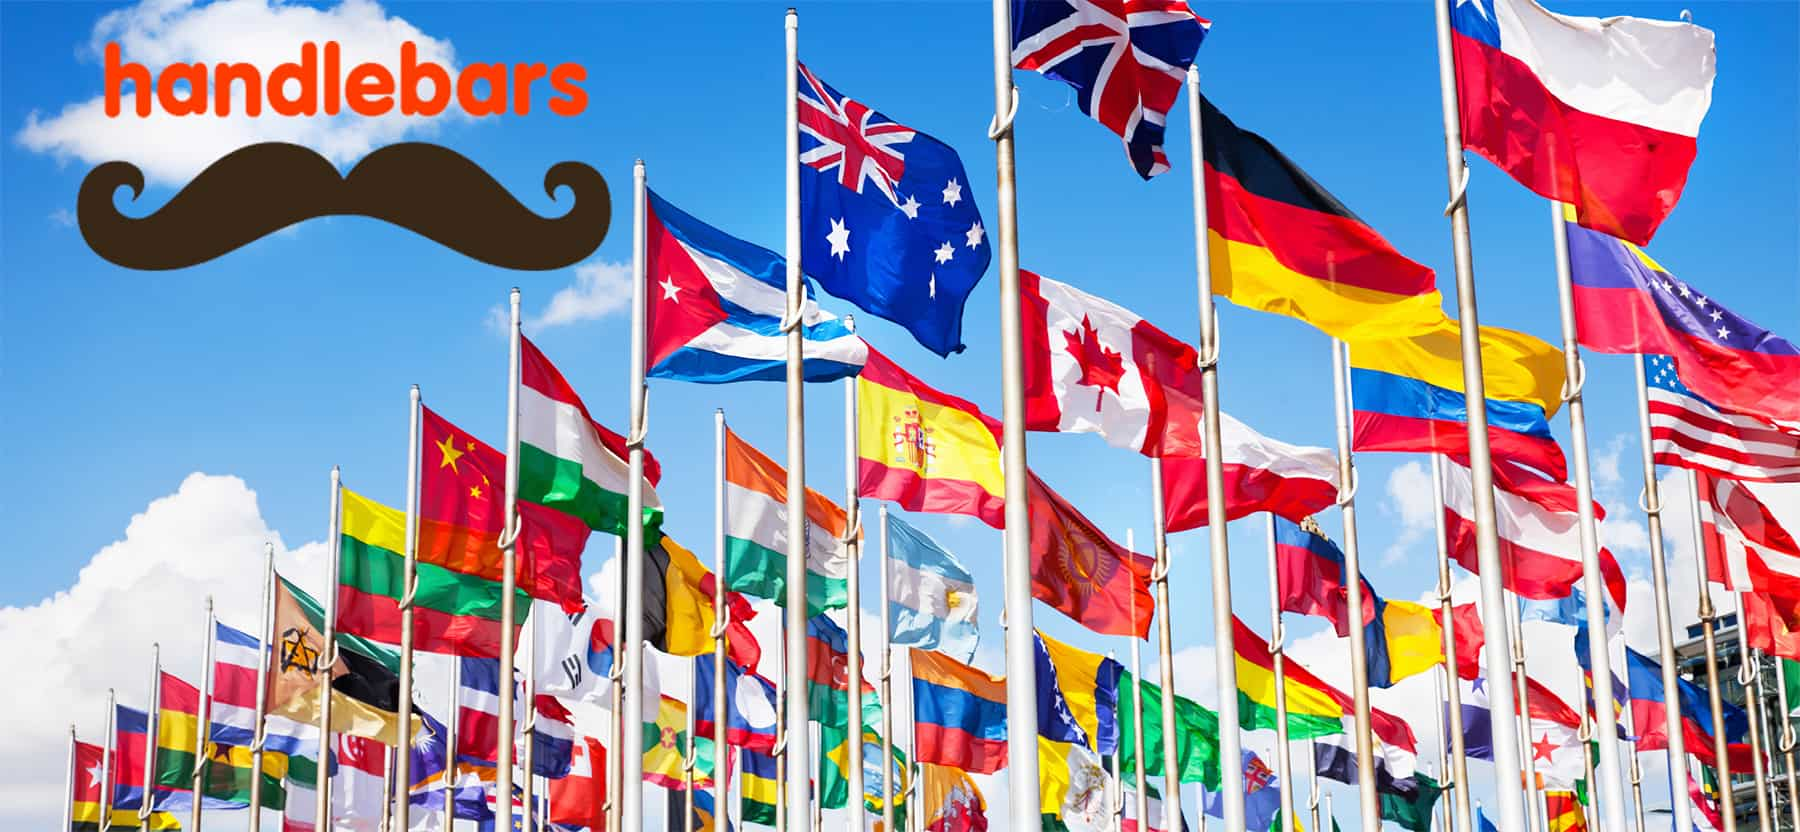 international-handlebars